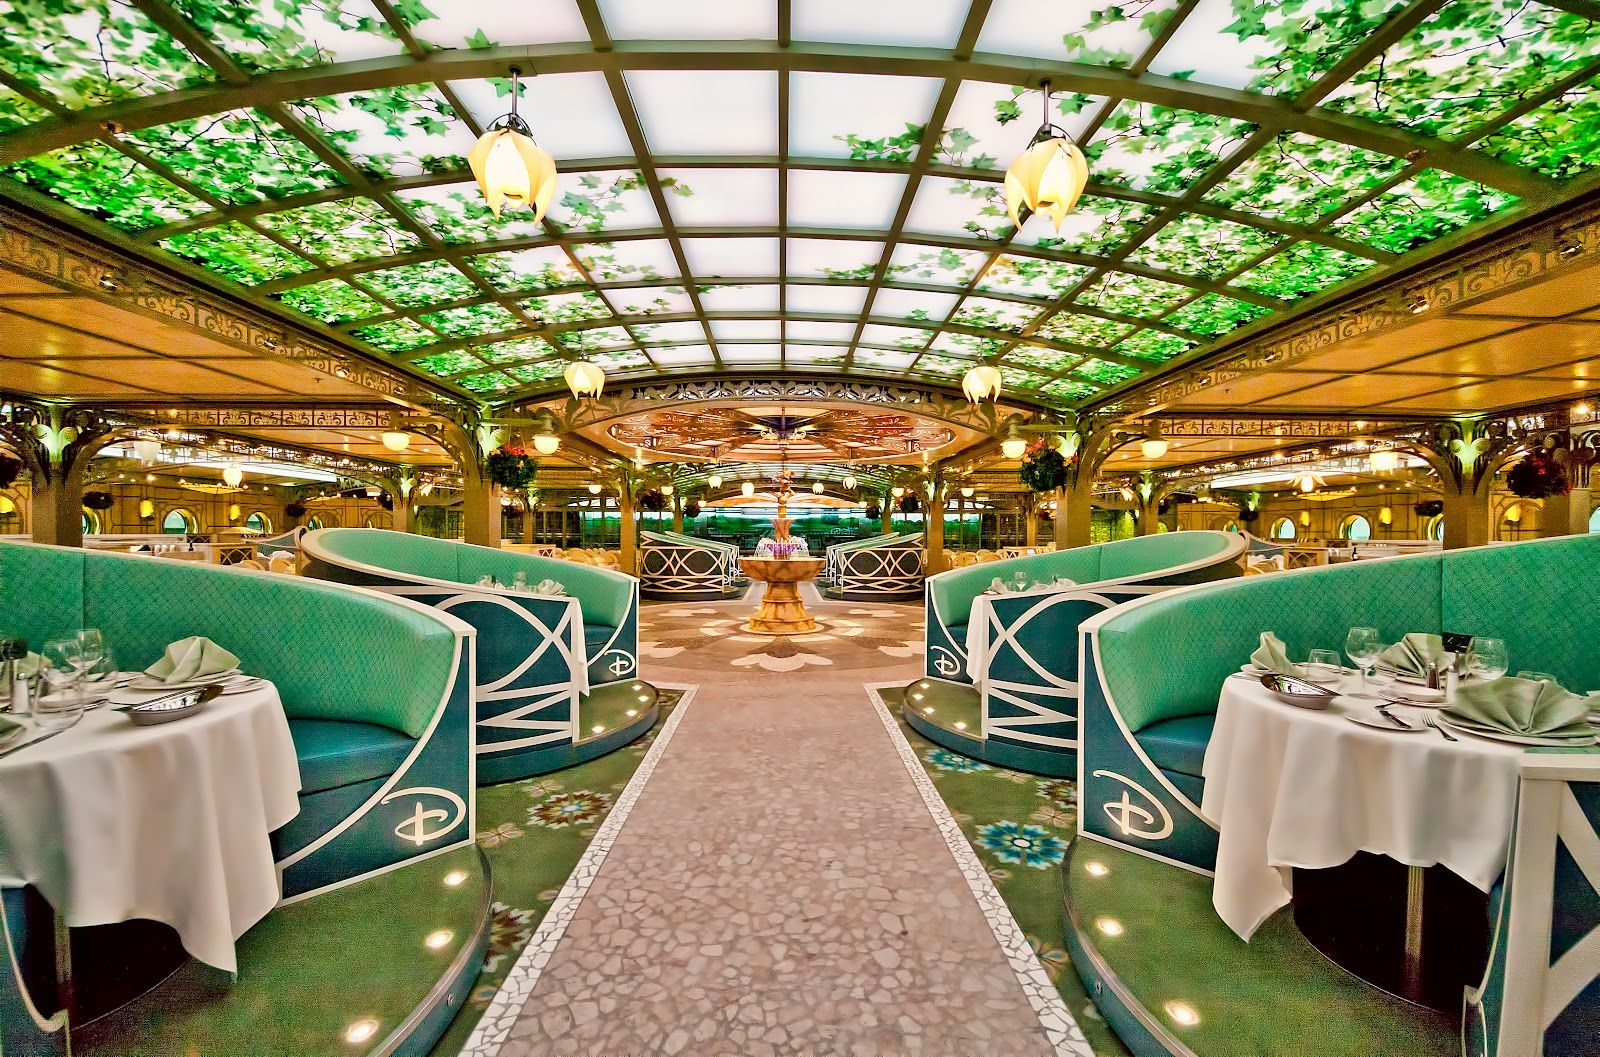 Enchanted Garden Restaurant On The Disney Fantasy Disney